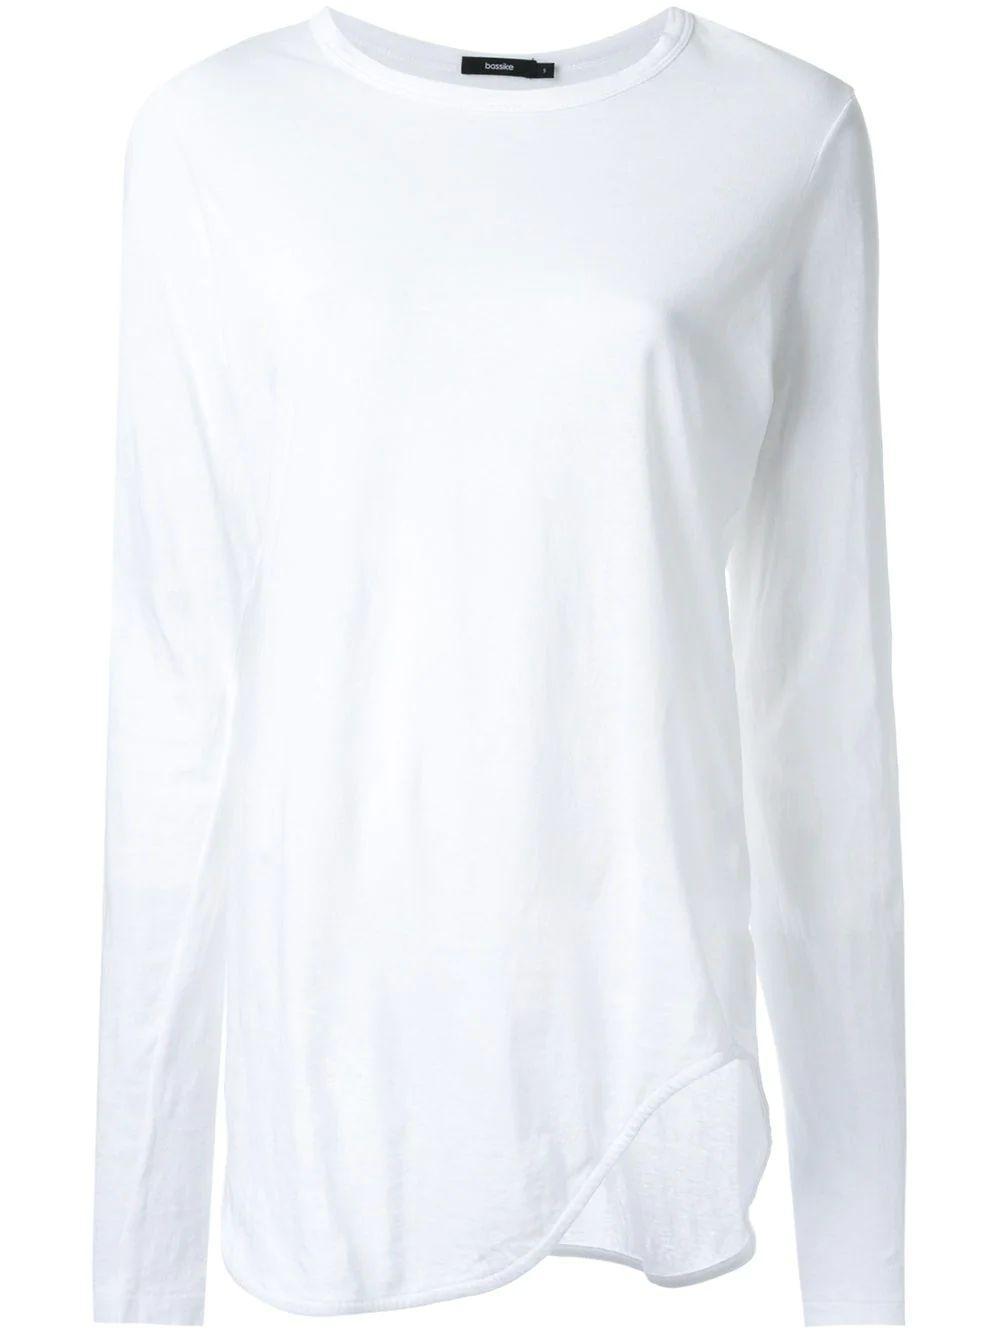 Heritage Scoop Hem Long Sleeve Tshirt Item # PC16WJT65